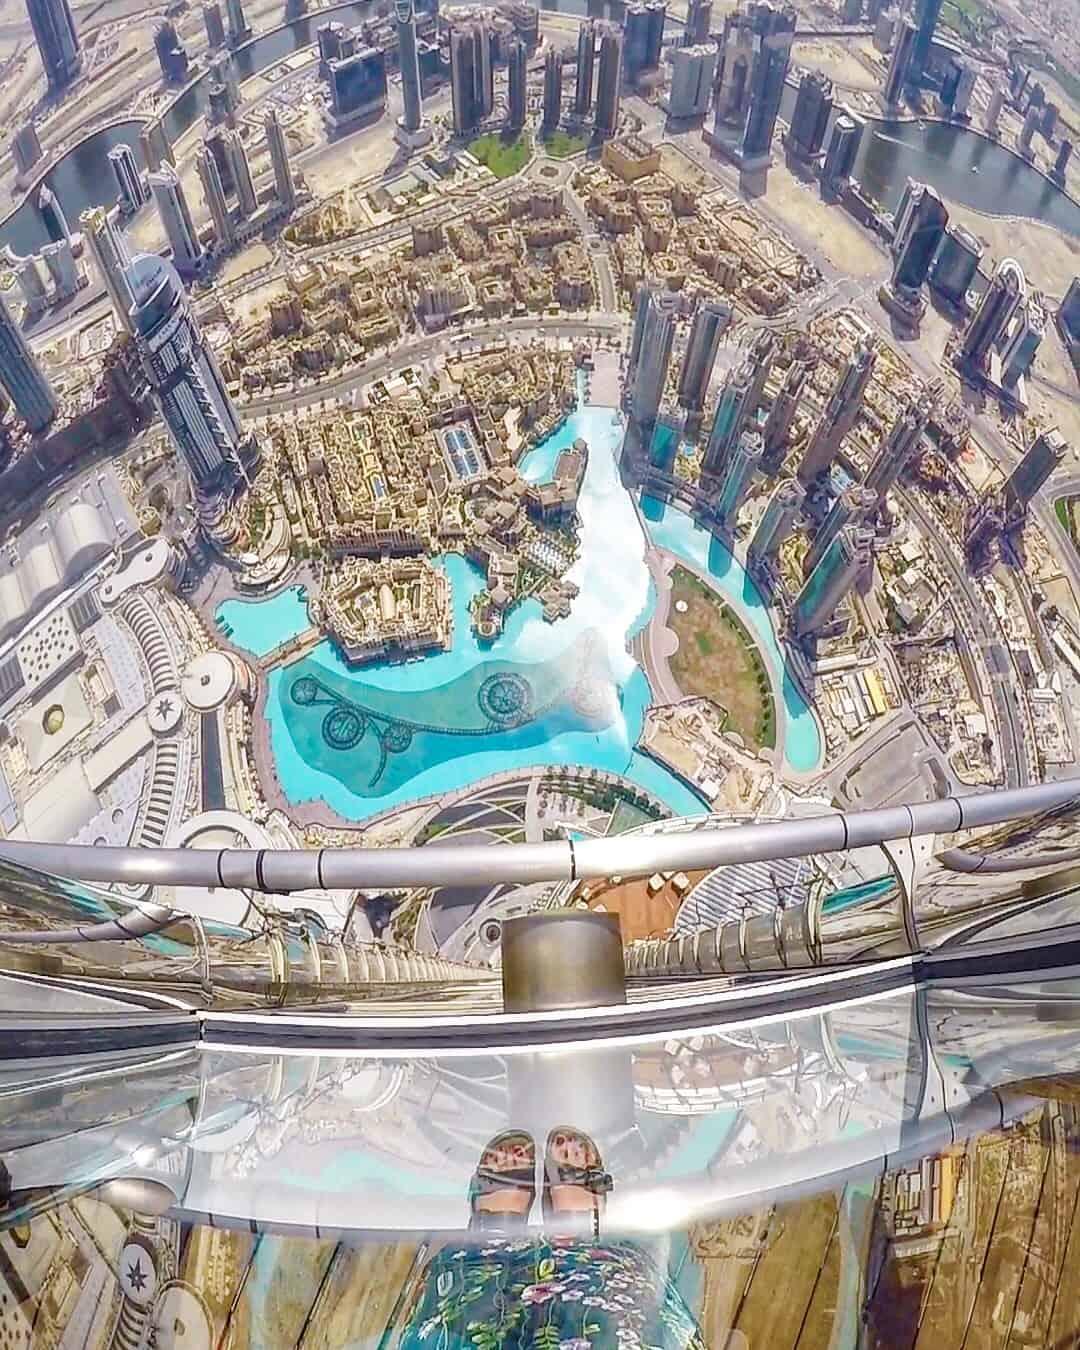 At The Top Burj Khalifa In Dubai - The